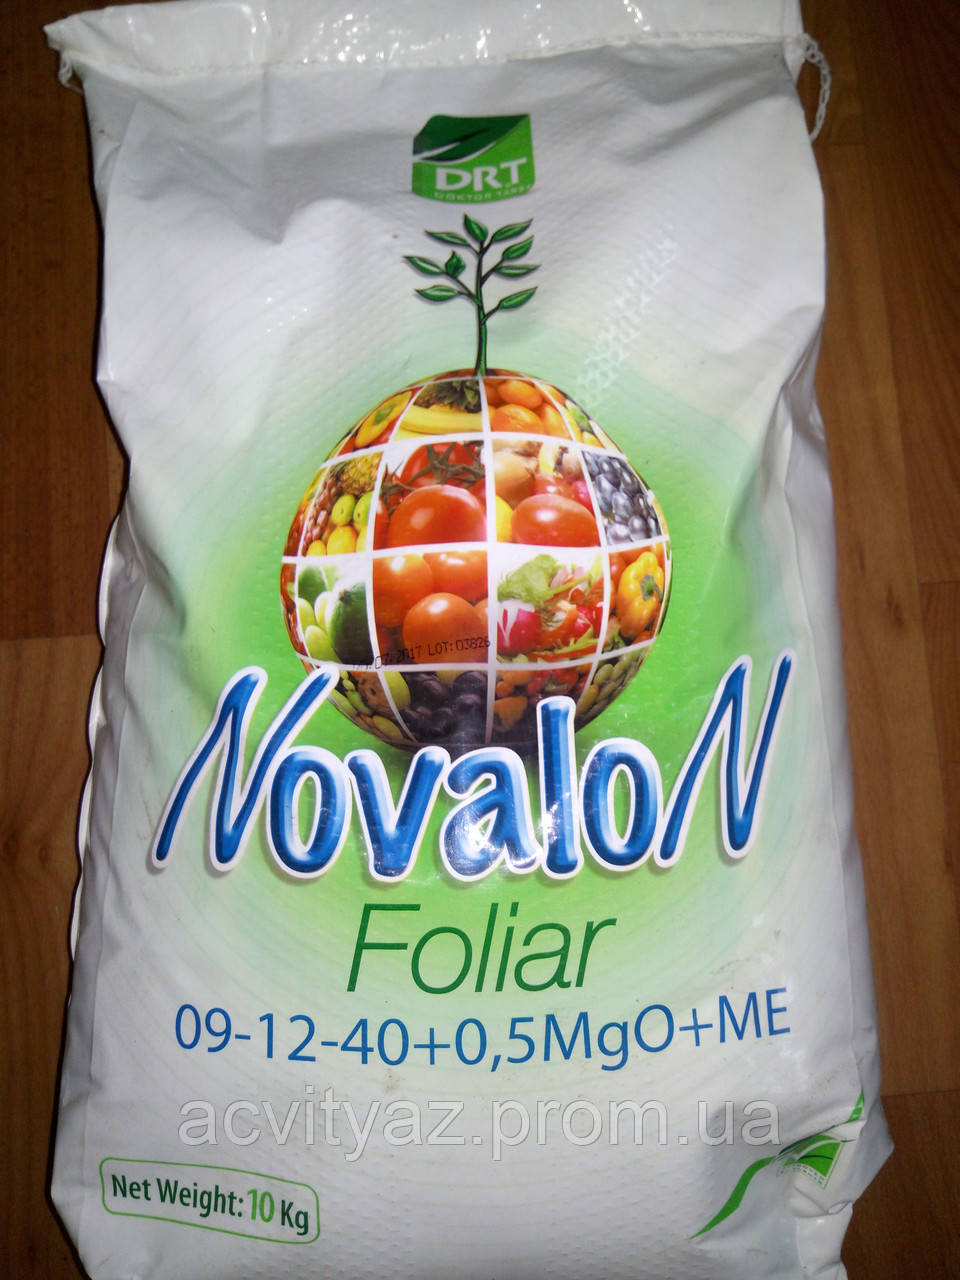 Водорастворимое удобрение Новалон Фолиар 9-12-40+0,5MgO+ME 10 кг